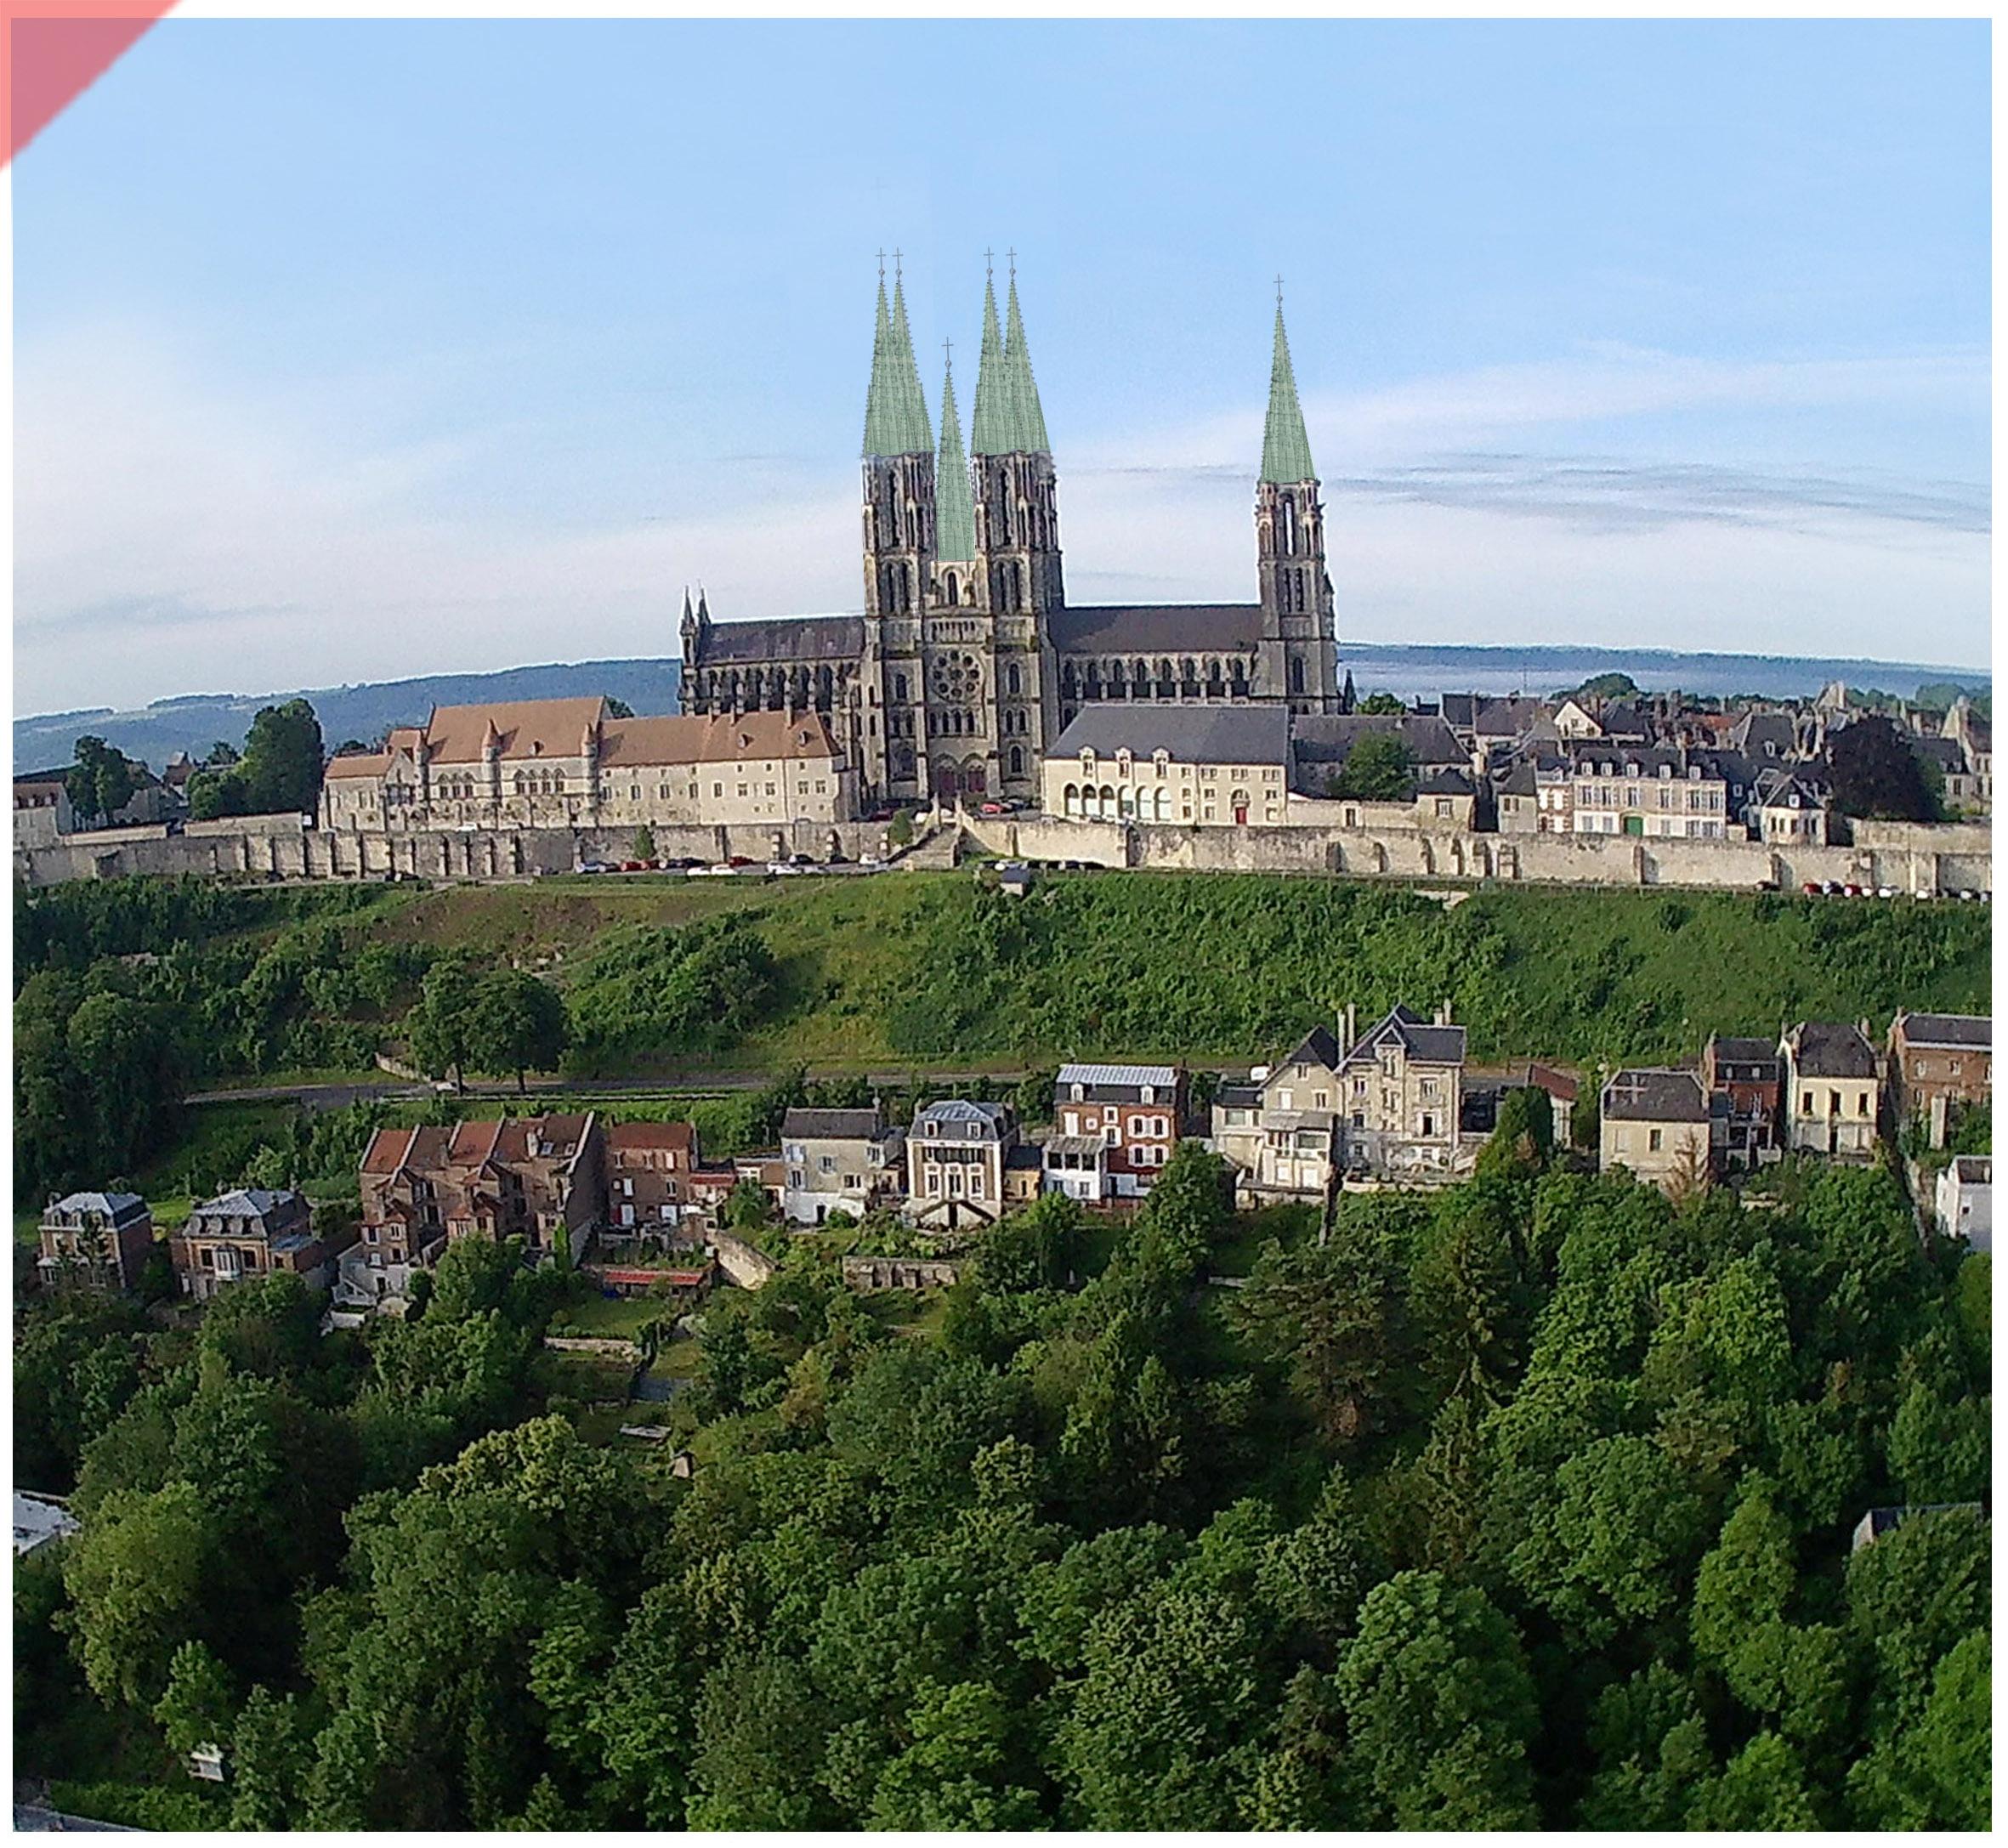 Laon-bleidach-grün-Kathedrale-2-Türme-Tuerme-Spitzdach-flach-Damals-Jetzt-Cathédrale-plomb-vert-vol-drone-2-deux-tours-façade-aériennes-tours avant-toits-plane-alors-et-maintenant-Laon-cathedral-drone-flight-cathedrale-aerial view-green-2-two-towers-façade-west-pitched roof-then-and-now